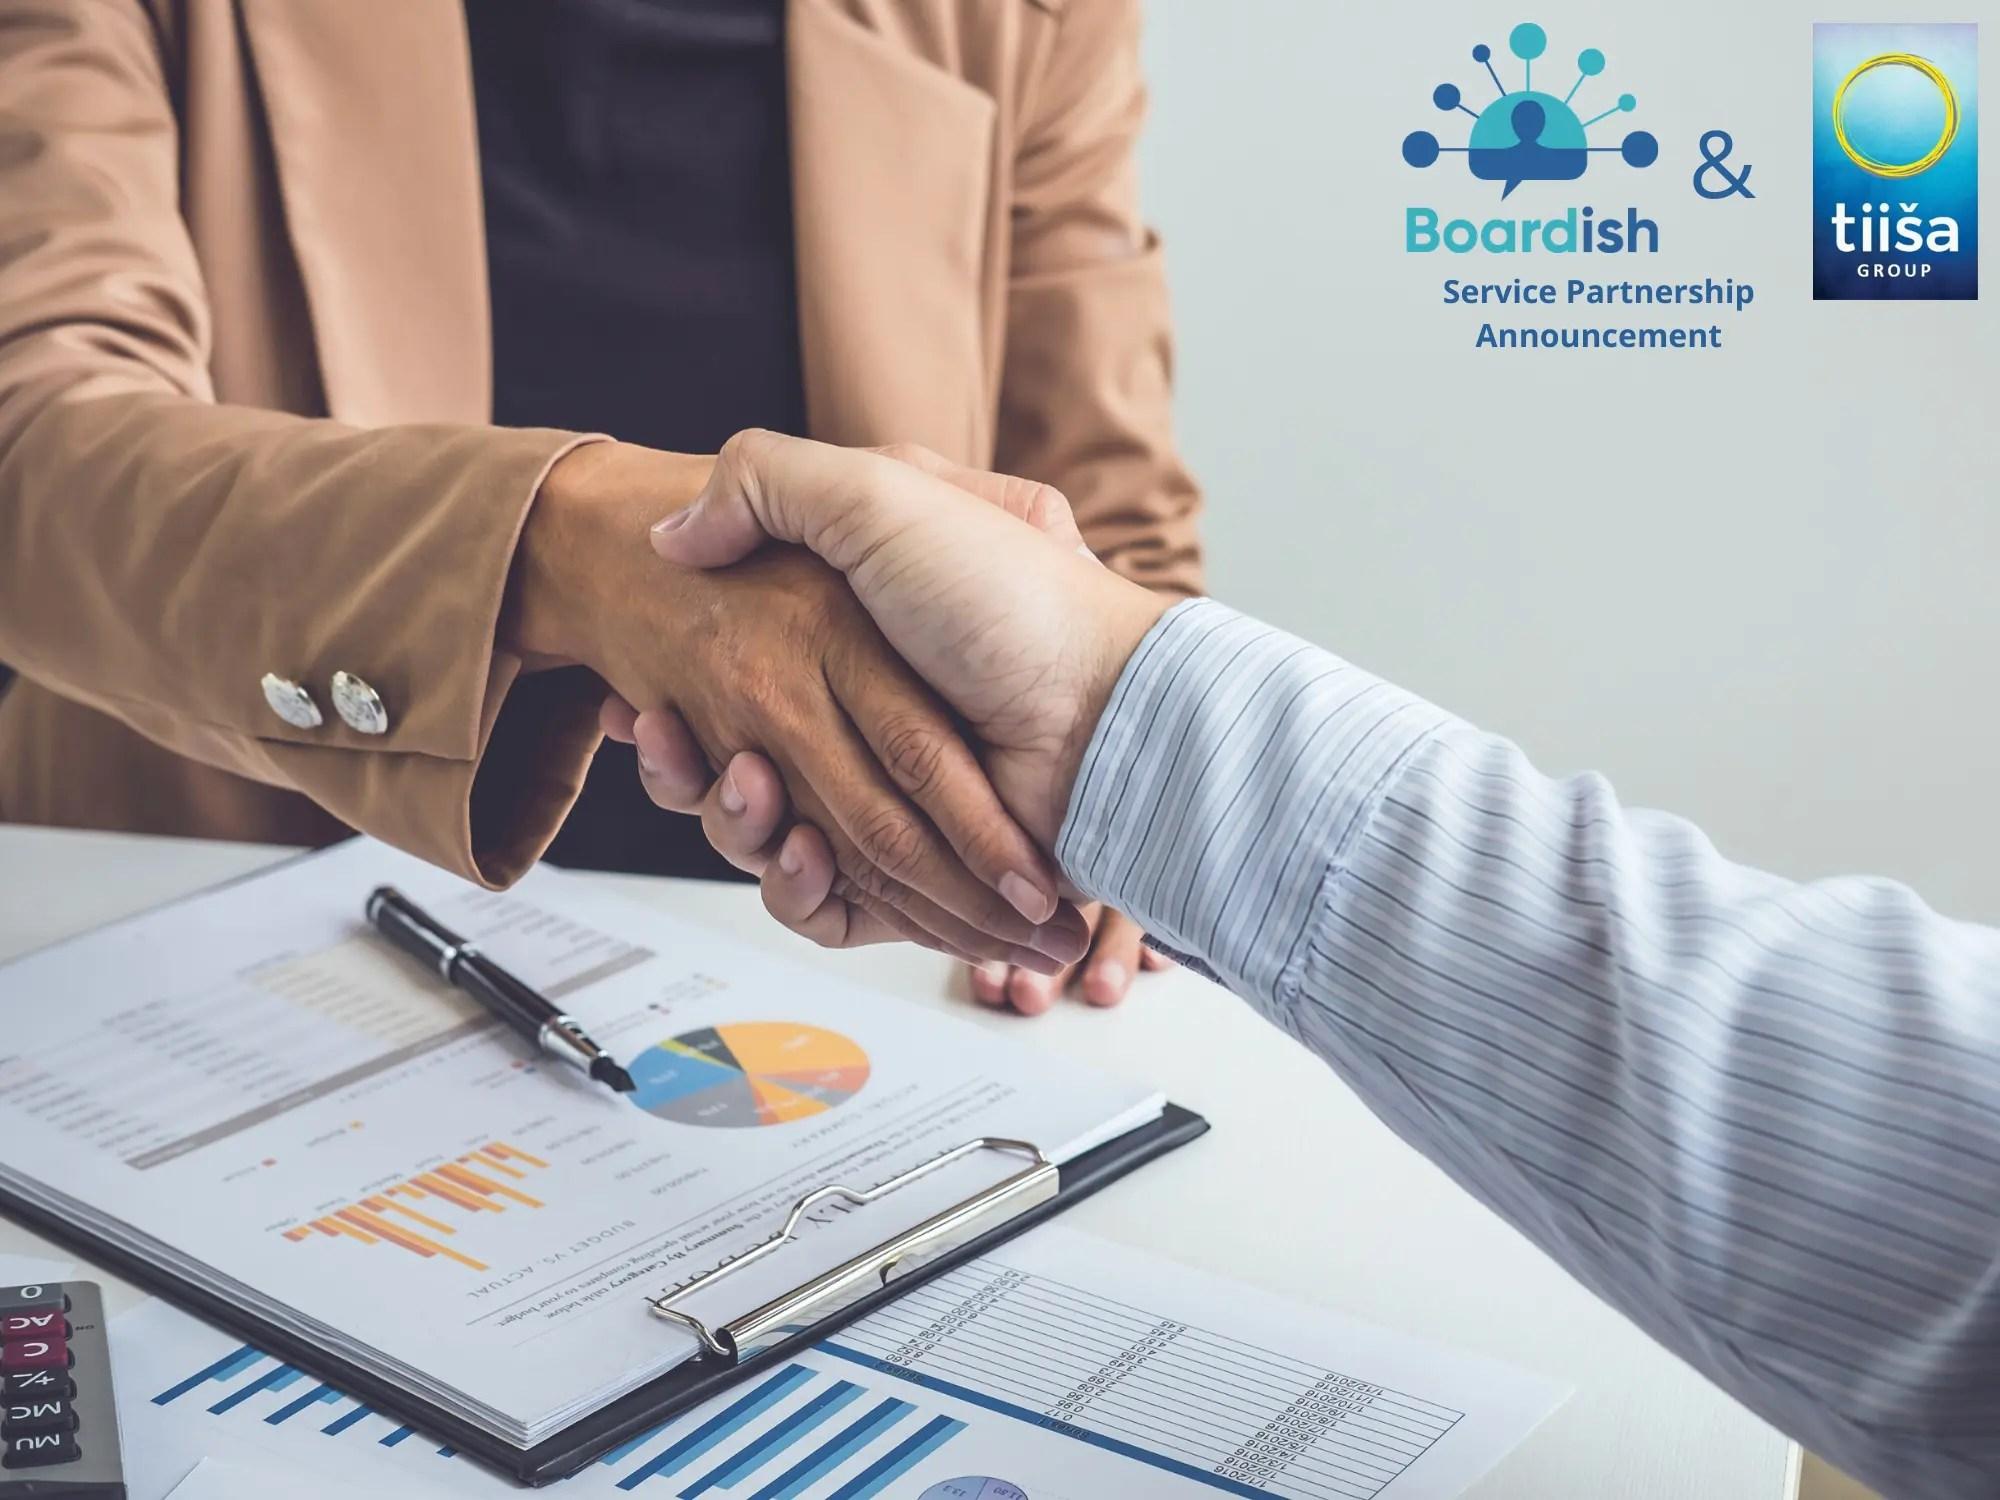 tiisa and boardish partnership announcement